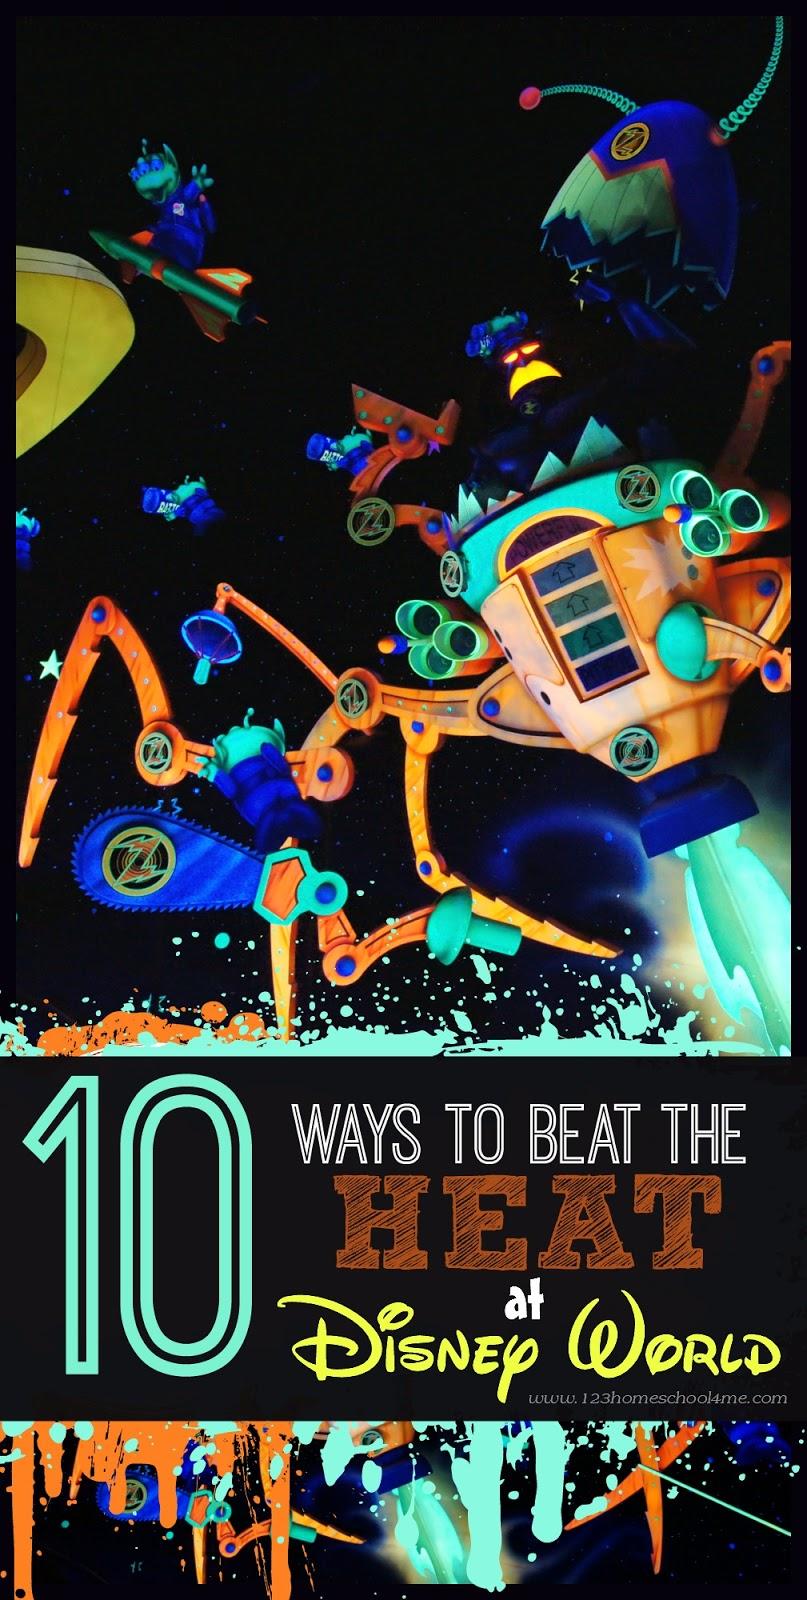 10 Ways to Beat the Heat at Disney World